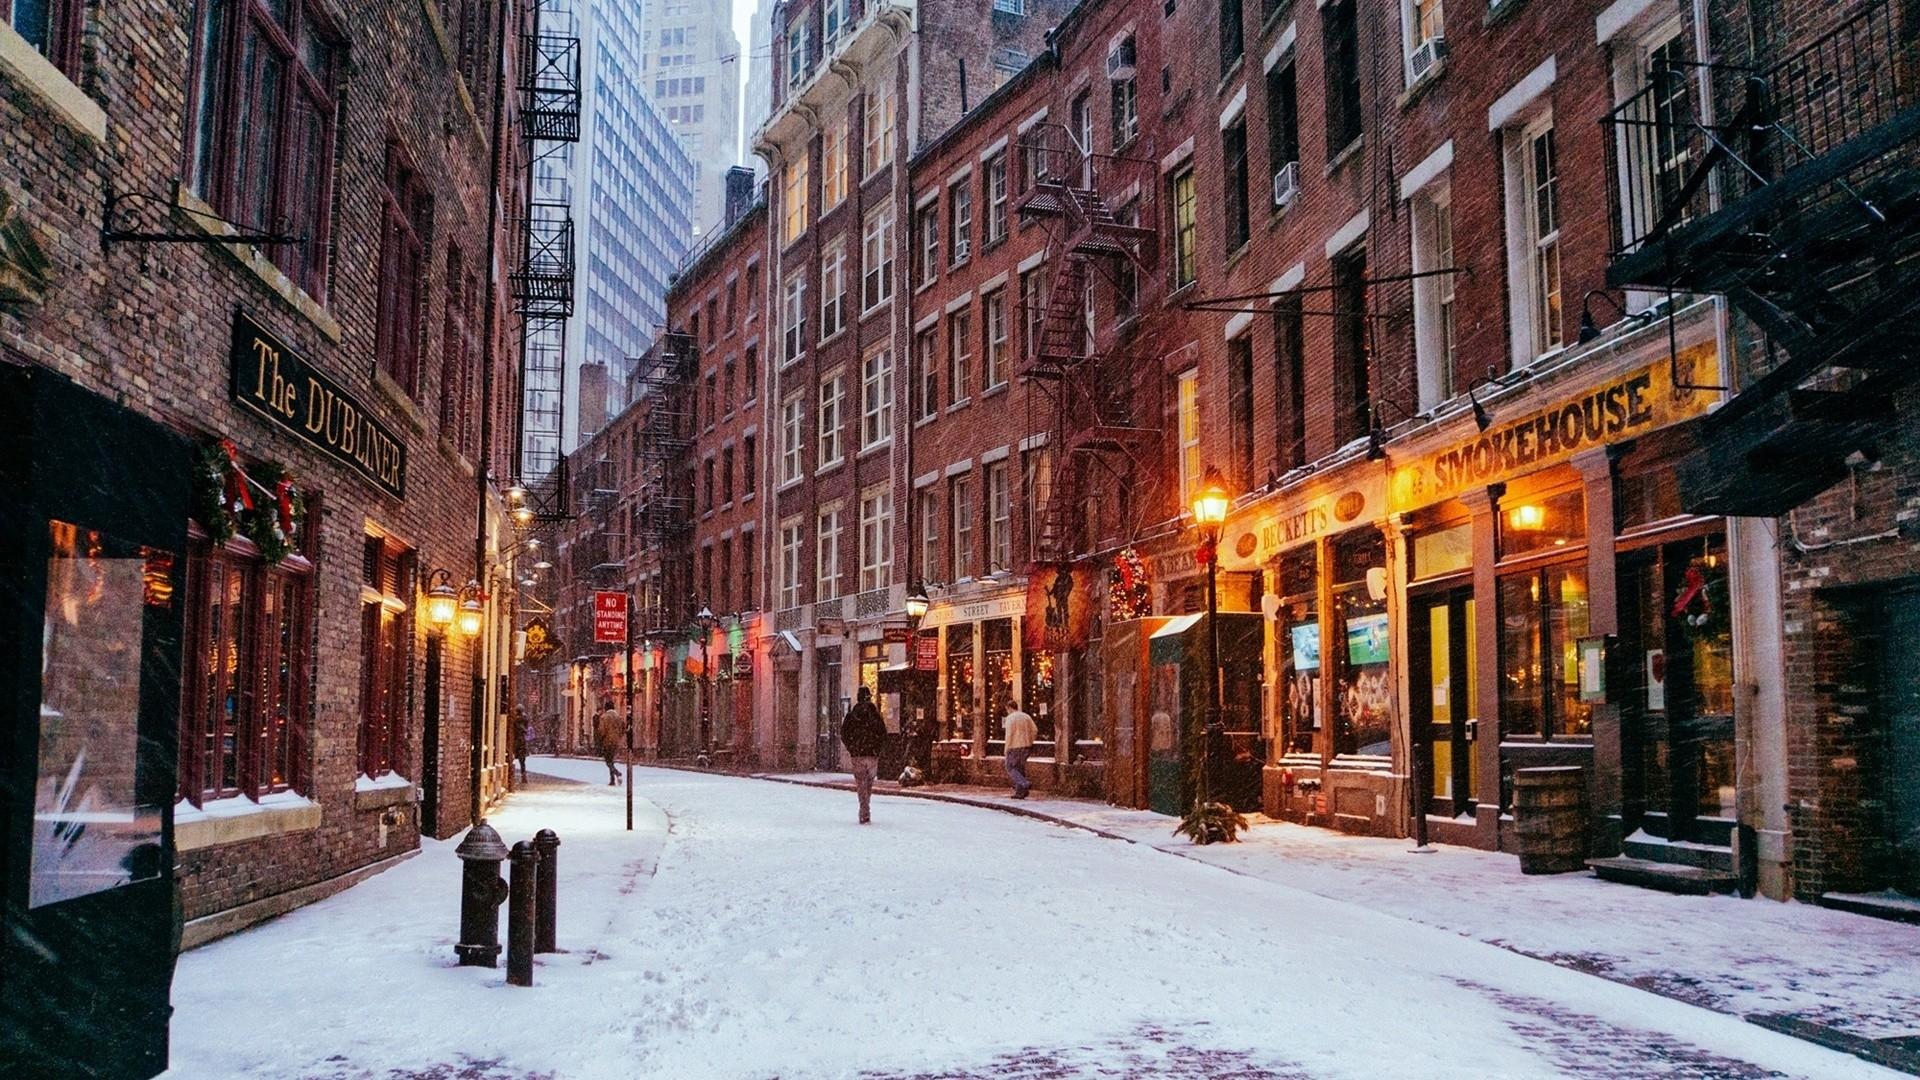 New York Street hd wallpaper download